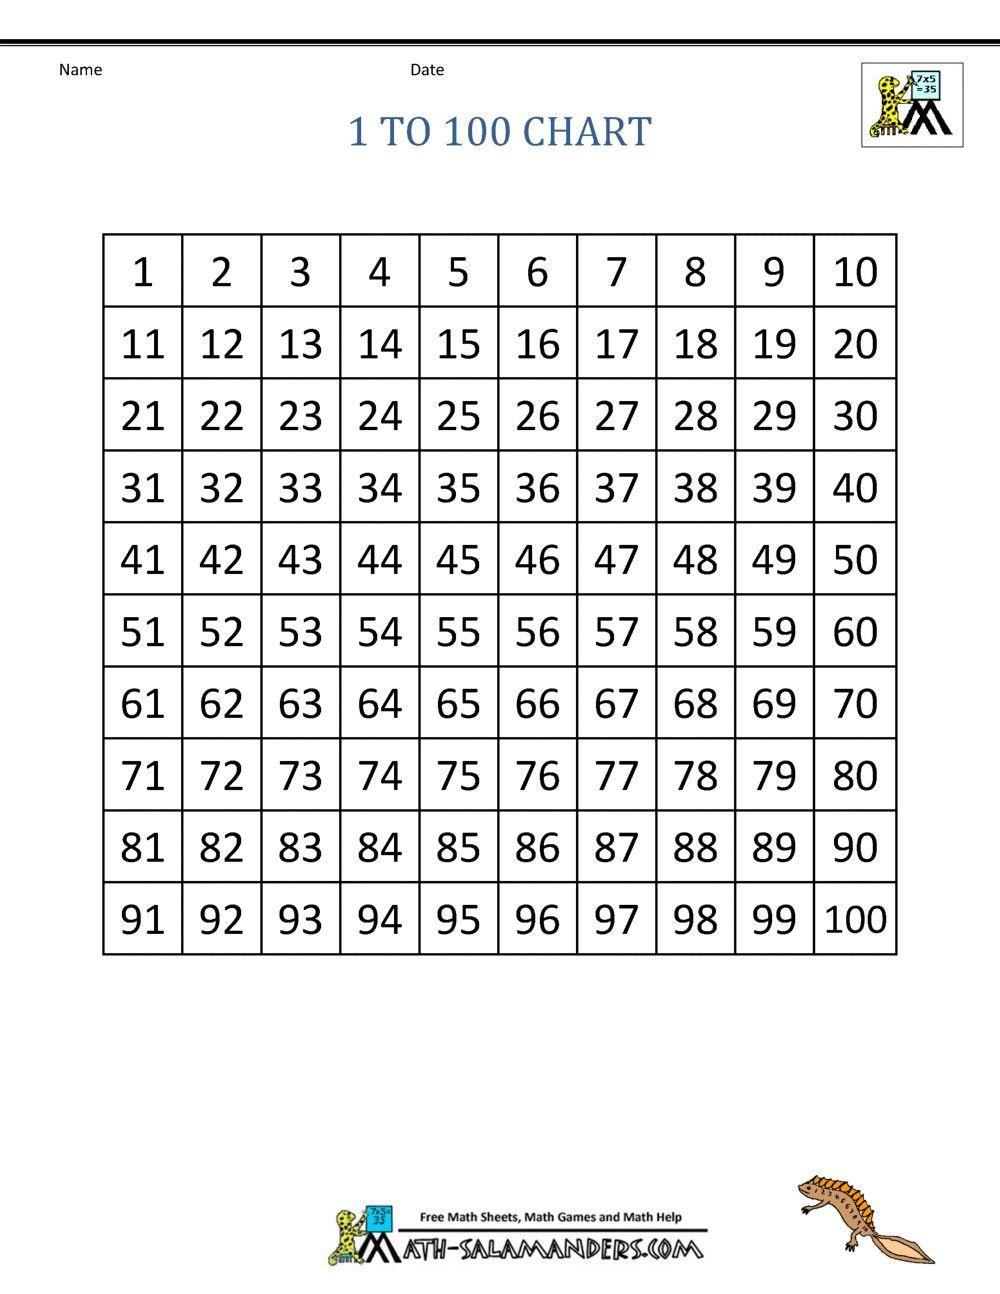 4 Mathematics Chart to 100 List Top 1 100 Chart Printable